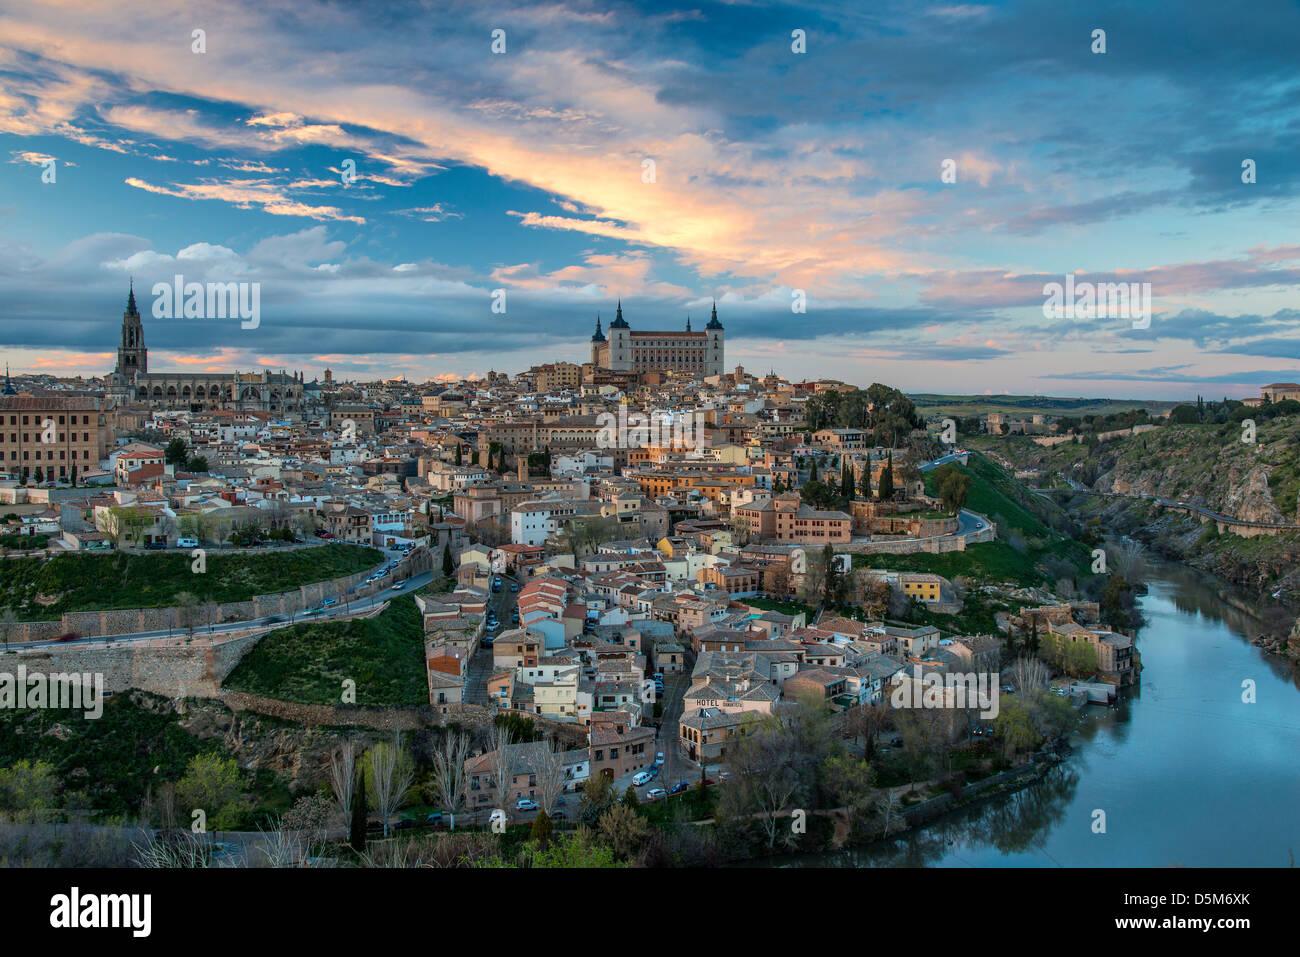 Skyline bei Sonnenuntergang, Toledo, Kastilien-La Mancha, Spanien Stockfoto